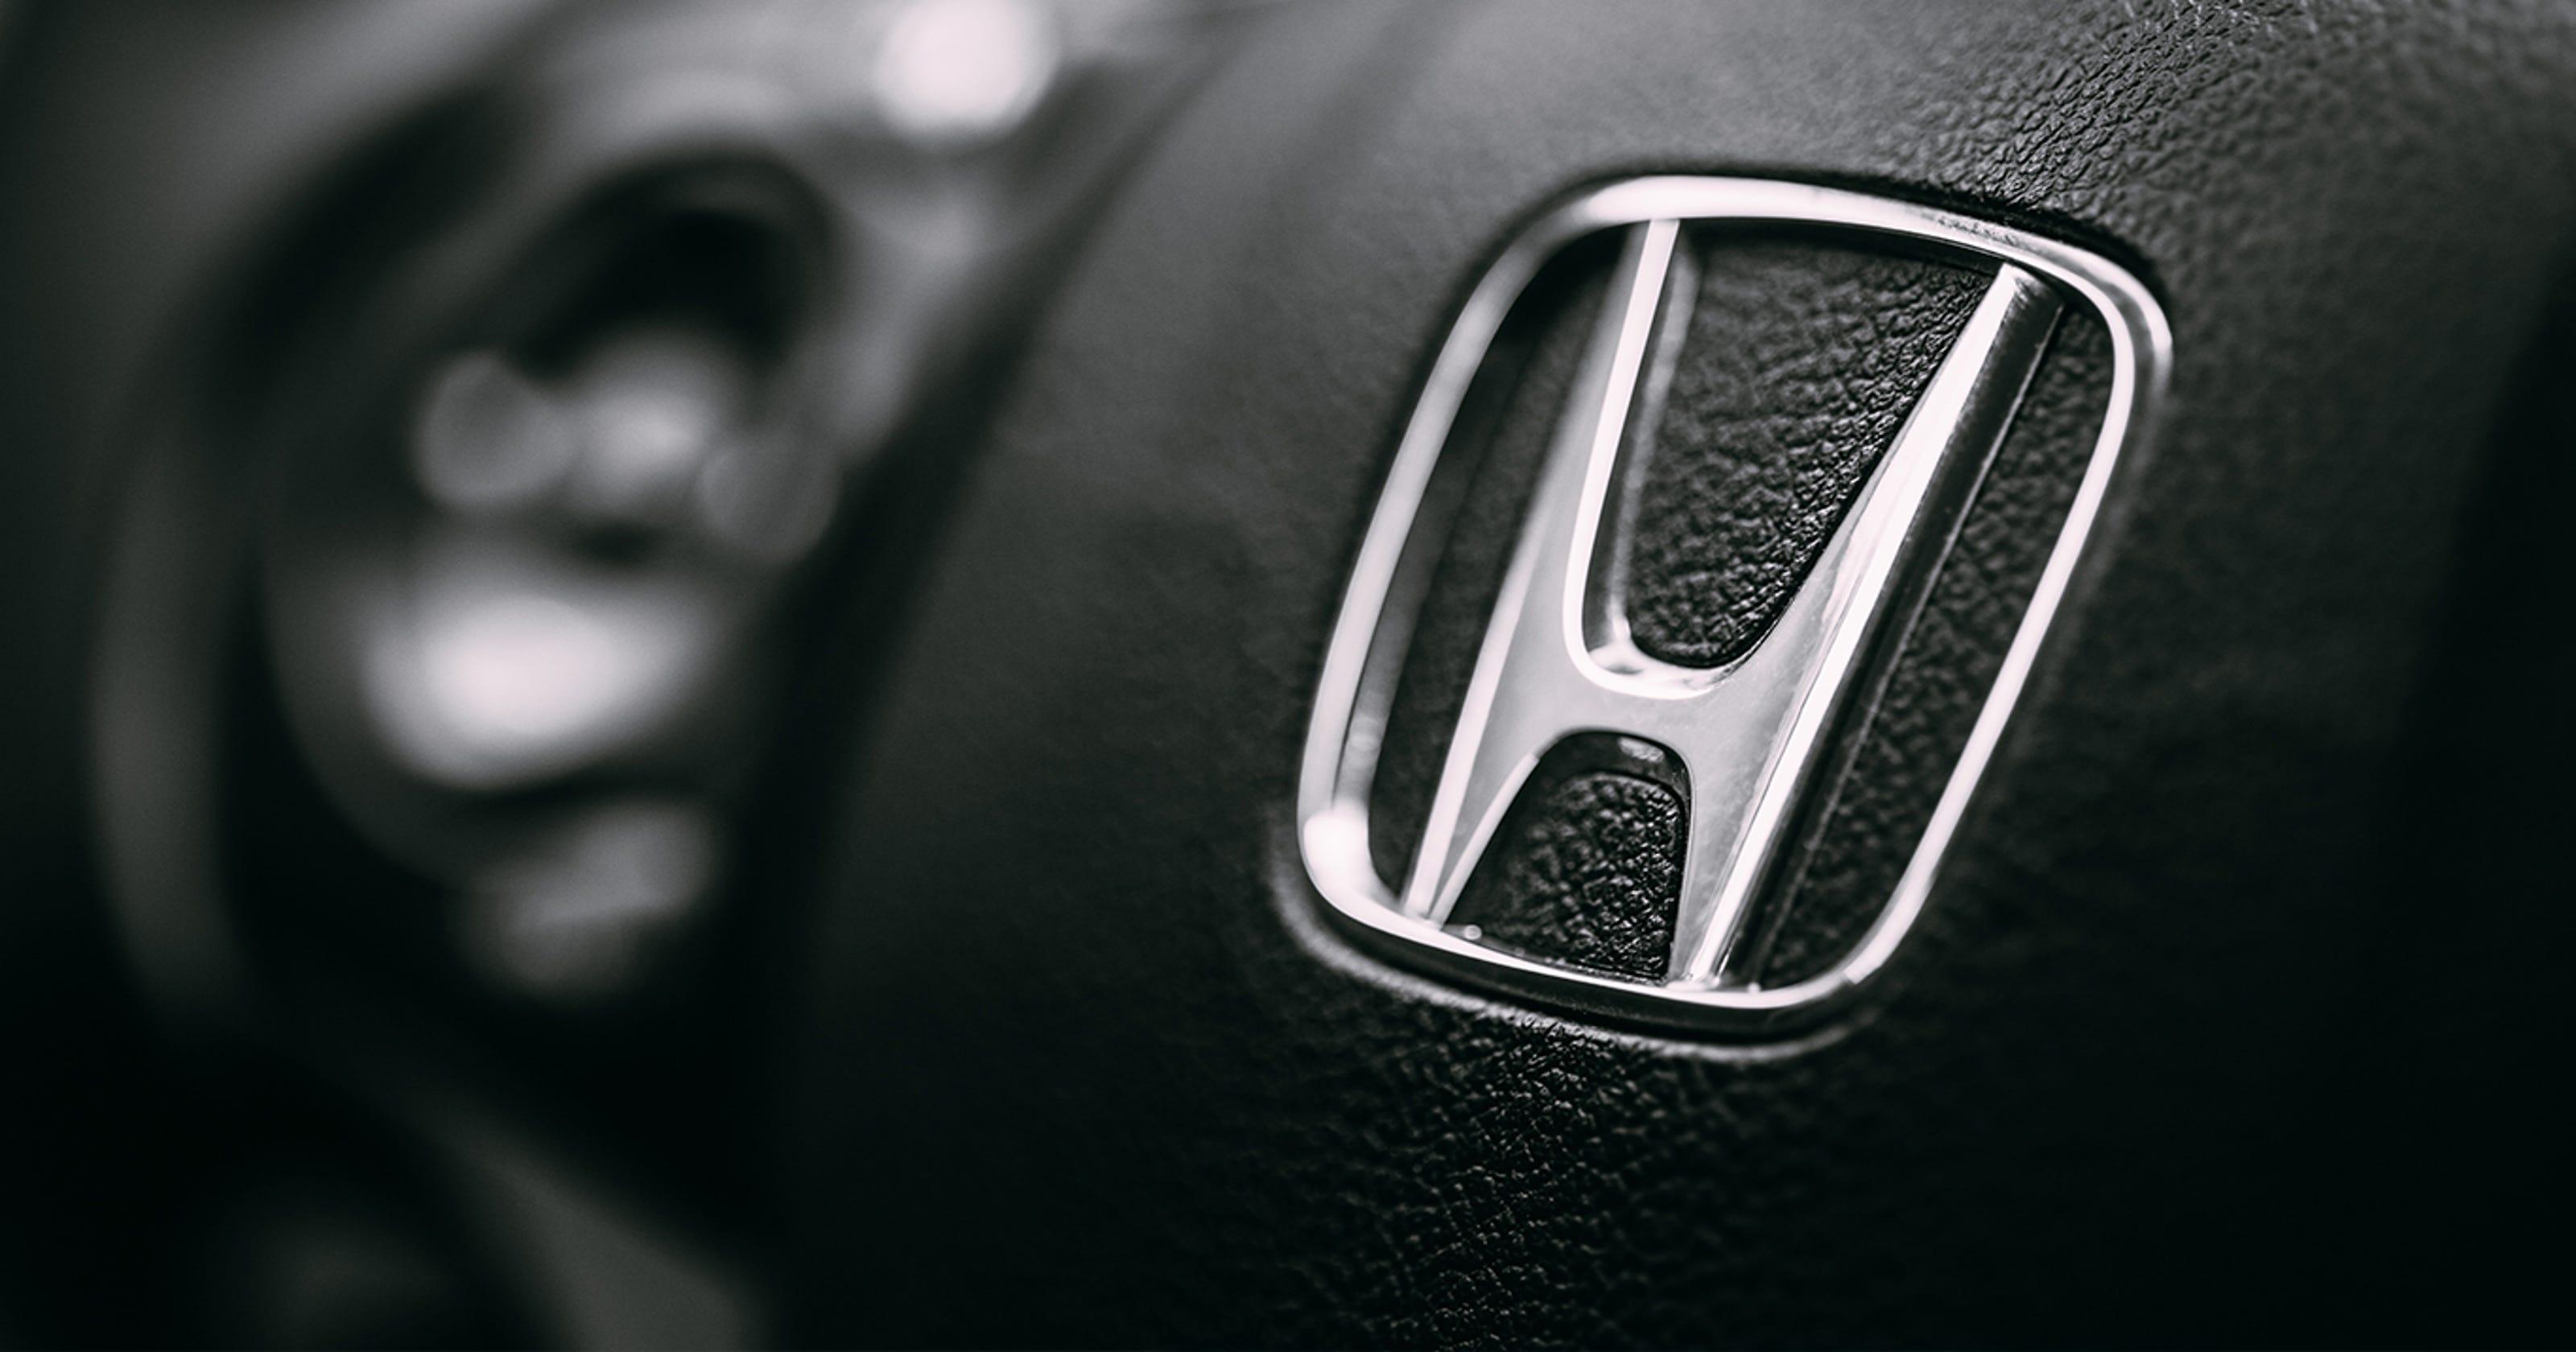 Recalls Honda Com >> Honda Takata Airbag Recall 1 6 Million Honda Acura Cars Recalled